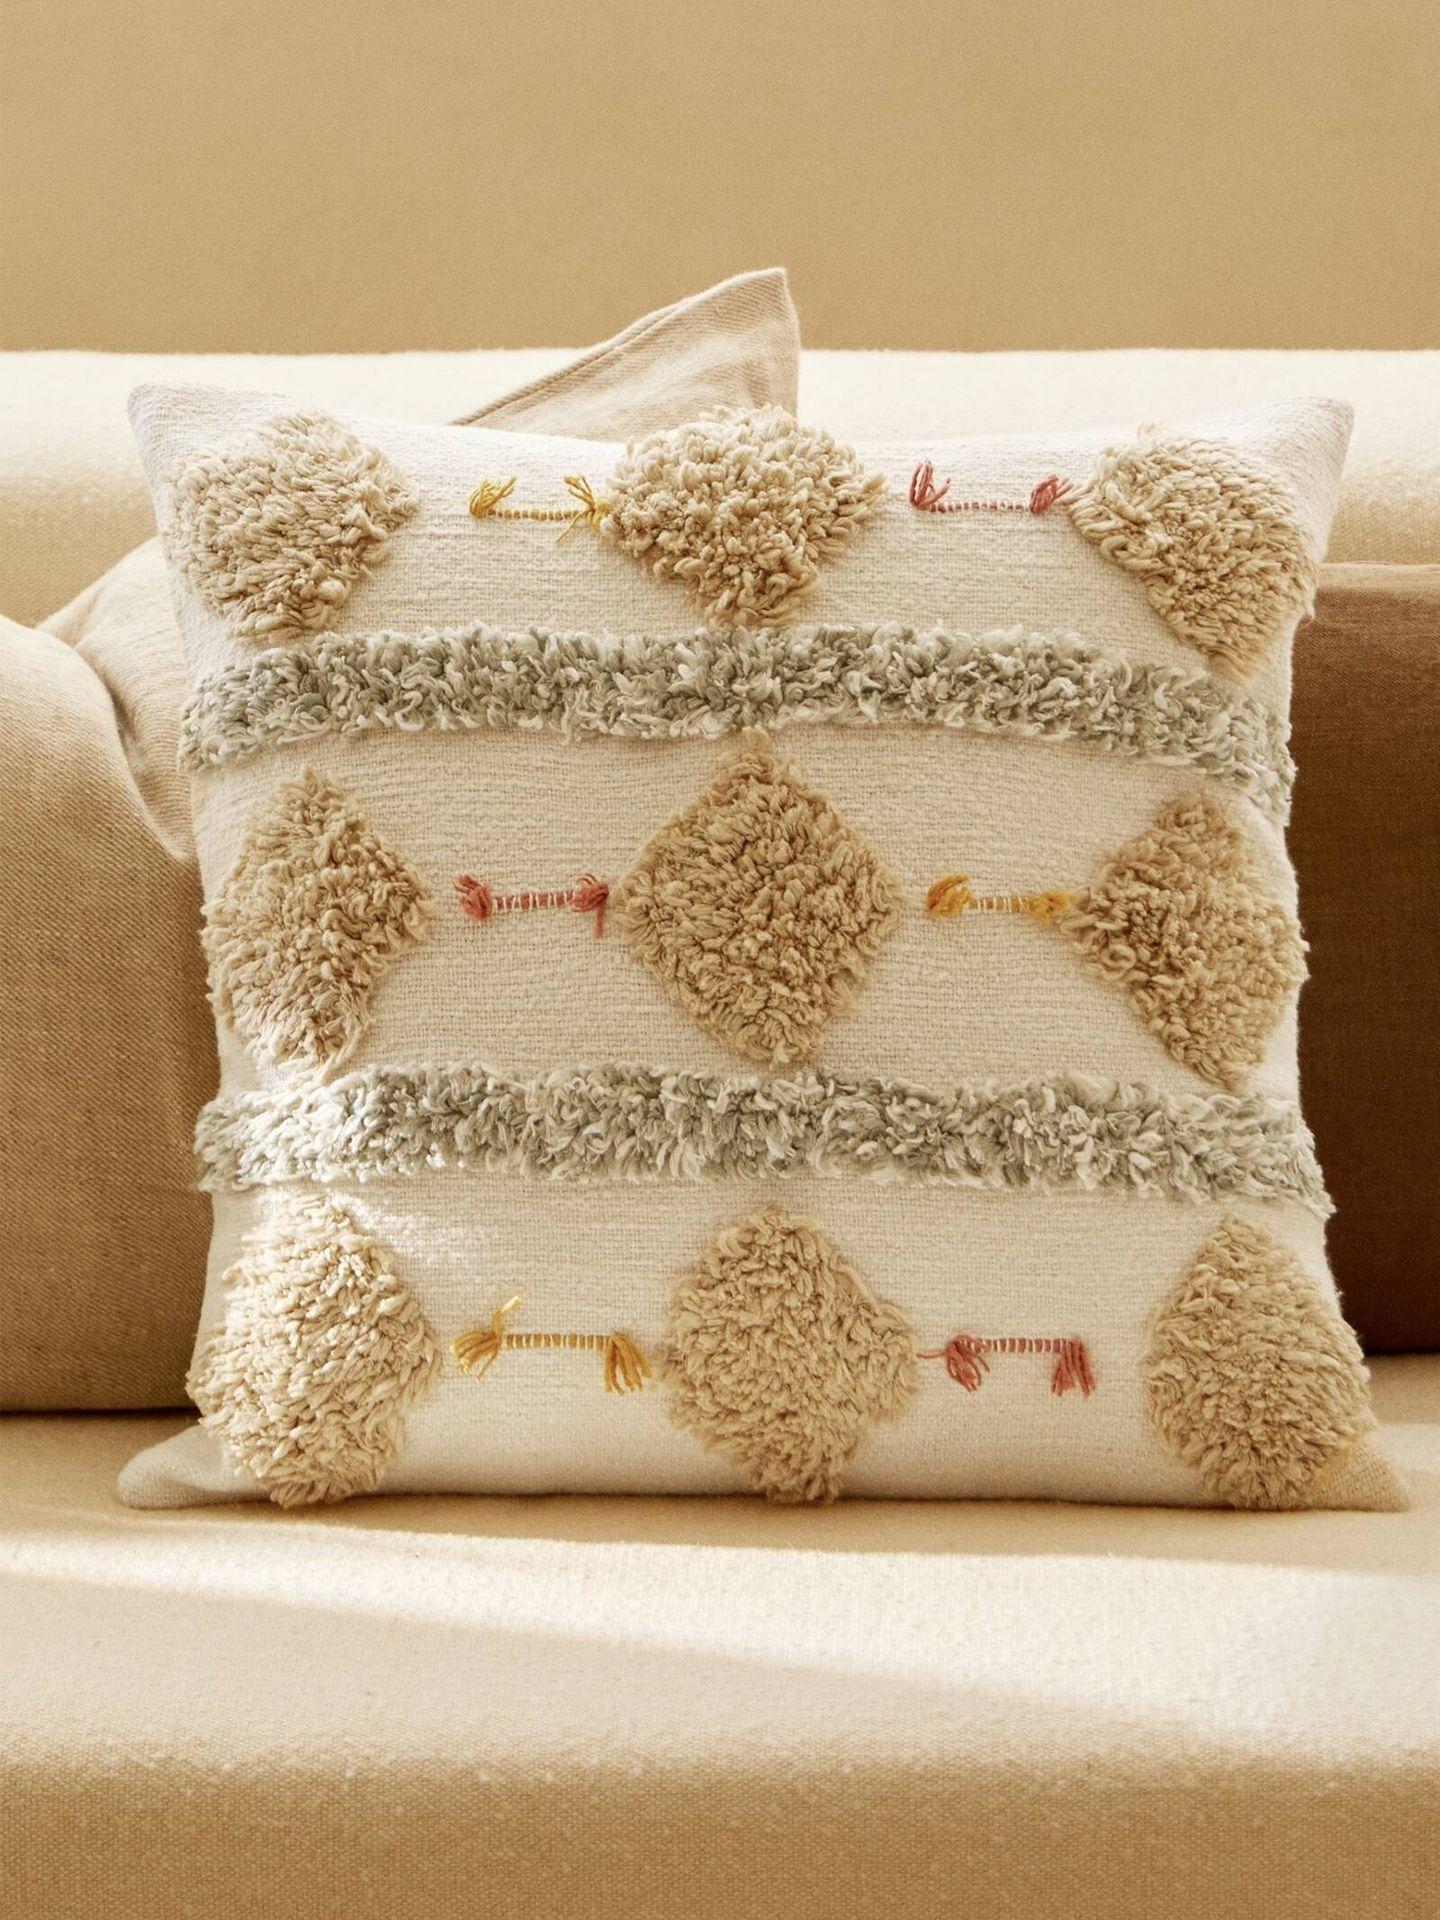 Novedades en complementos de Zara Home para actualizar tu casa. (Cortesía)